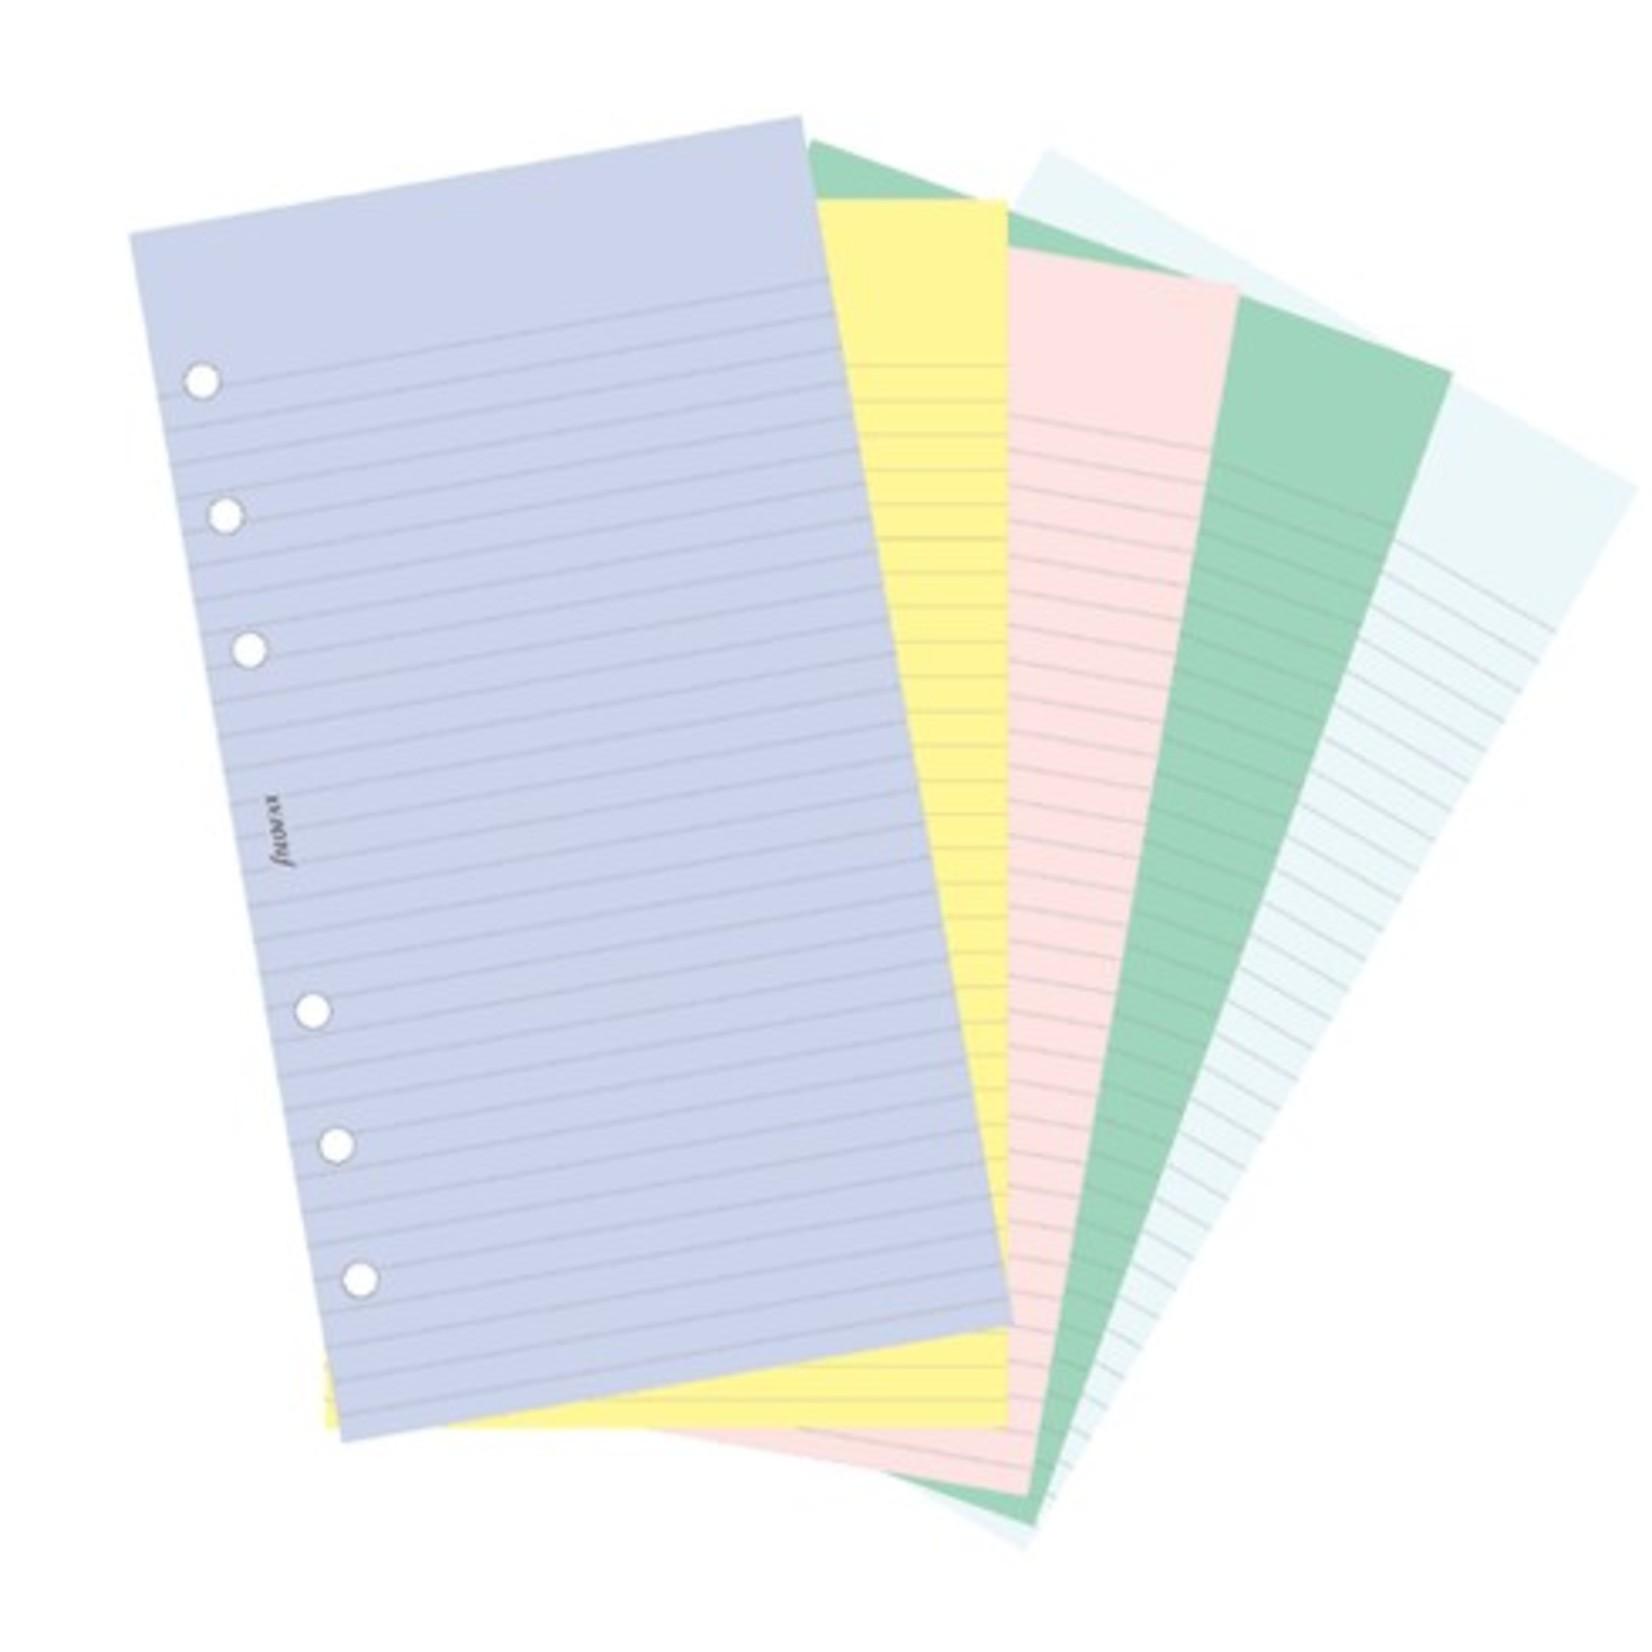 Filofax Filofax Einlage Personal, Papier blanko, 100 Bl., weiß